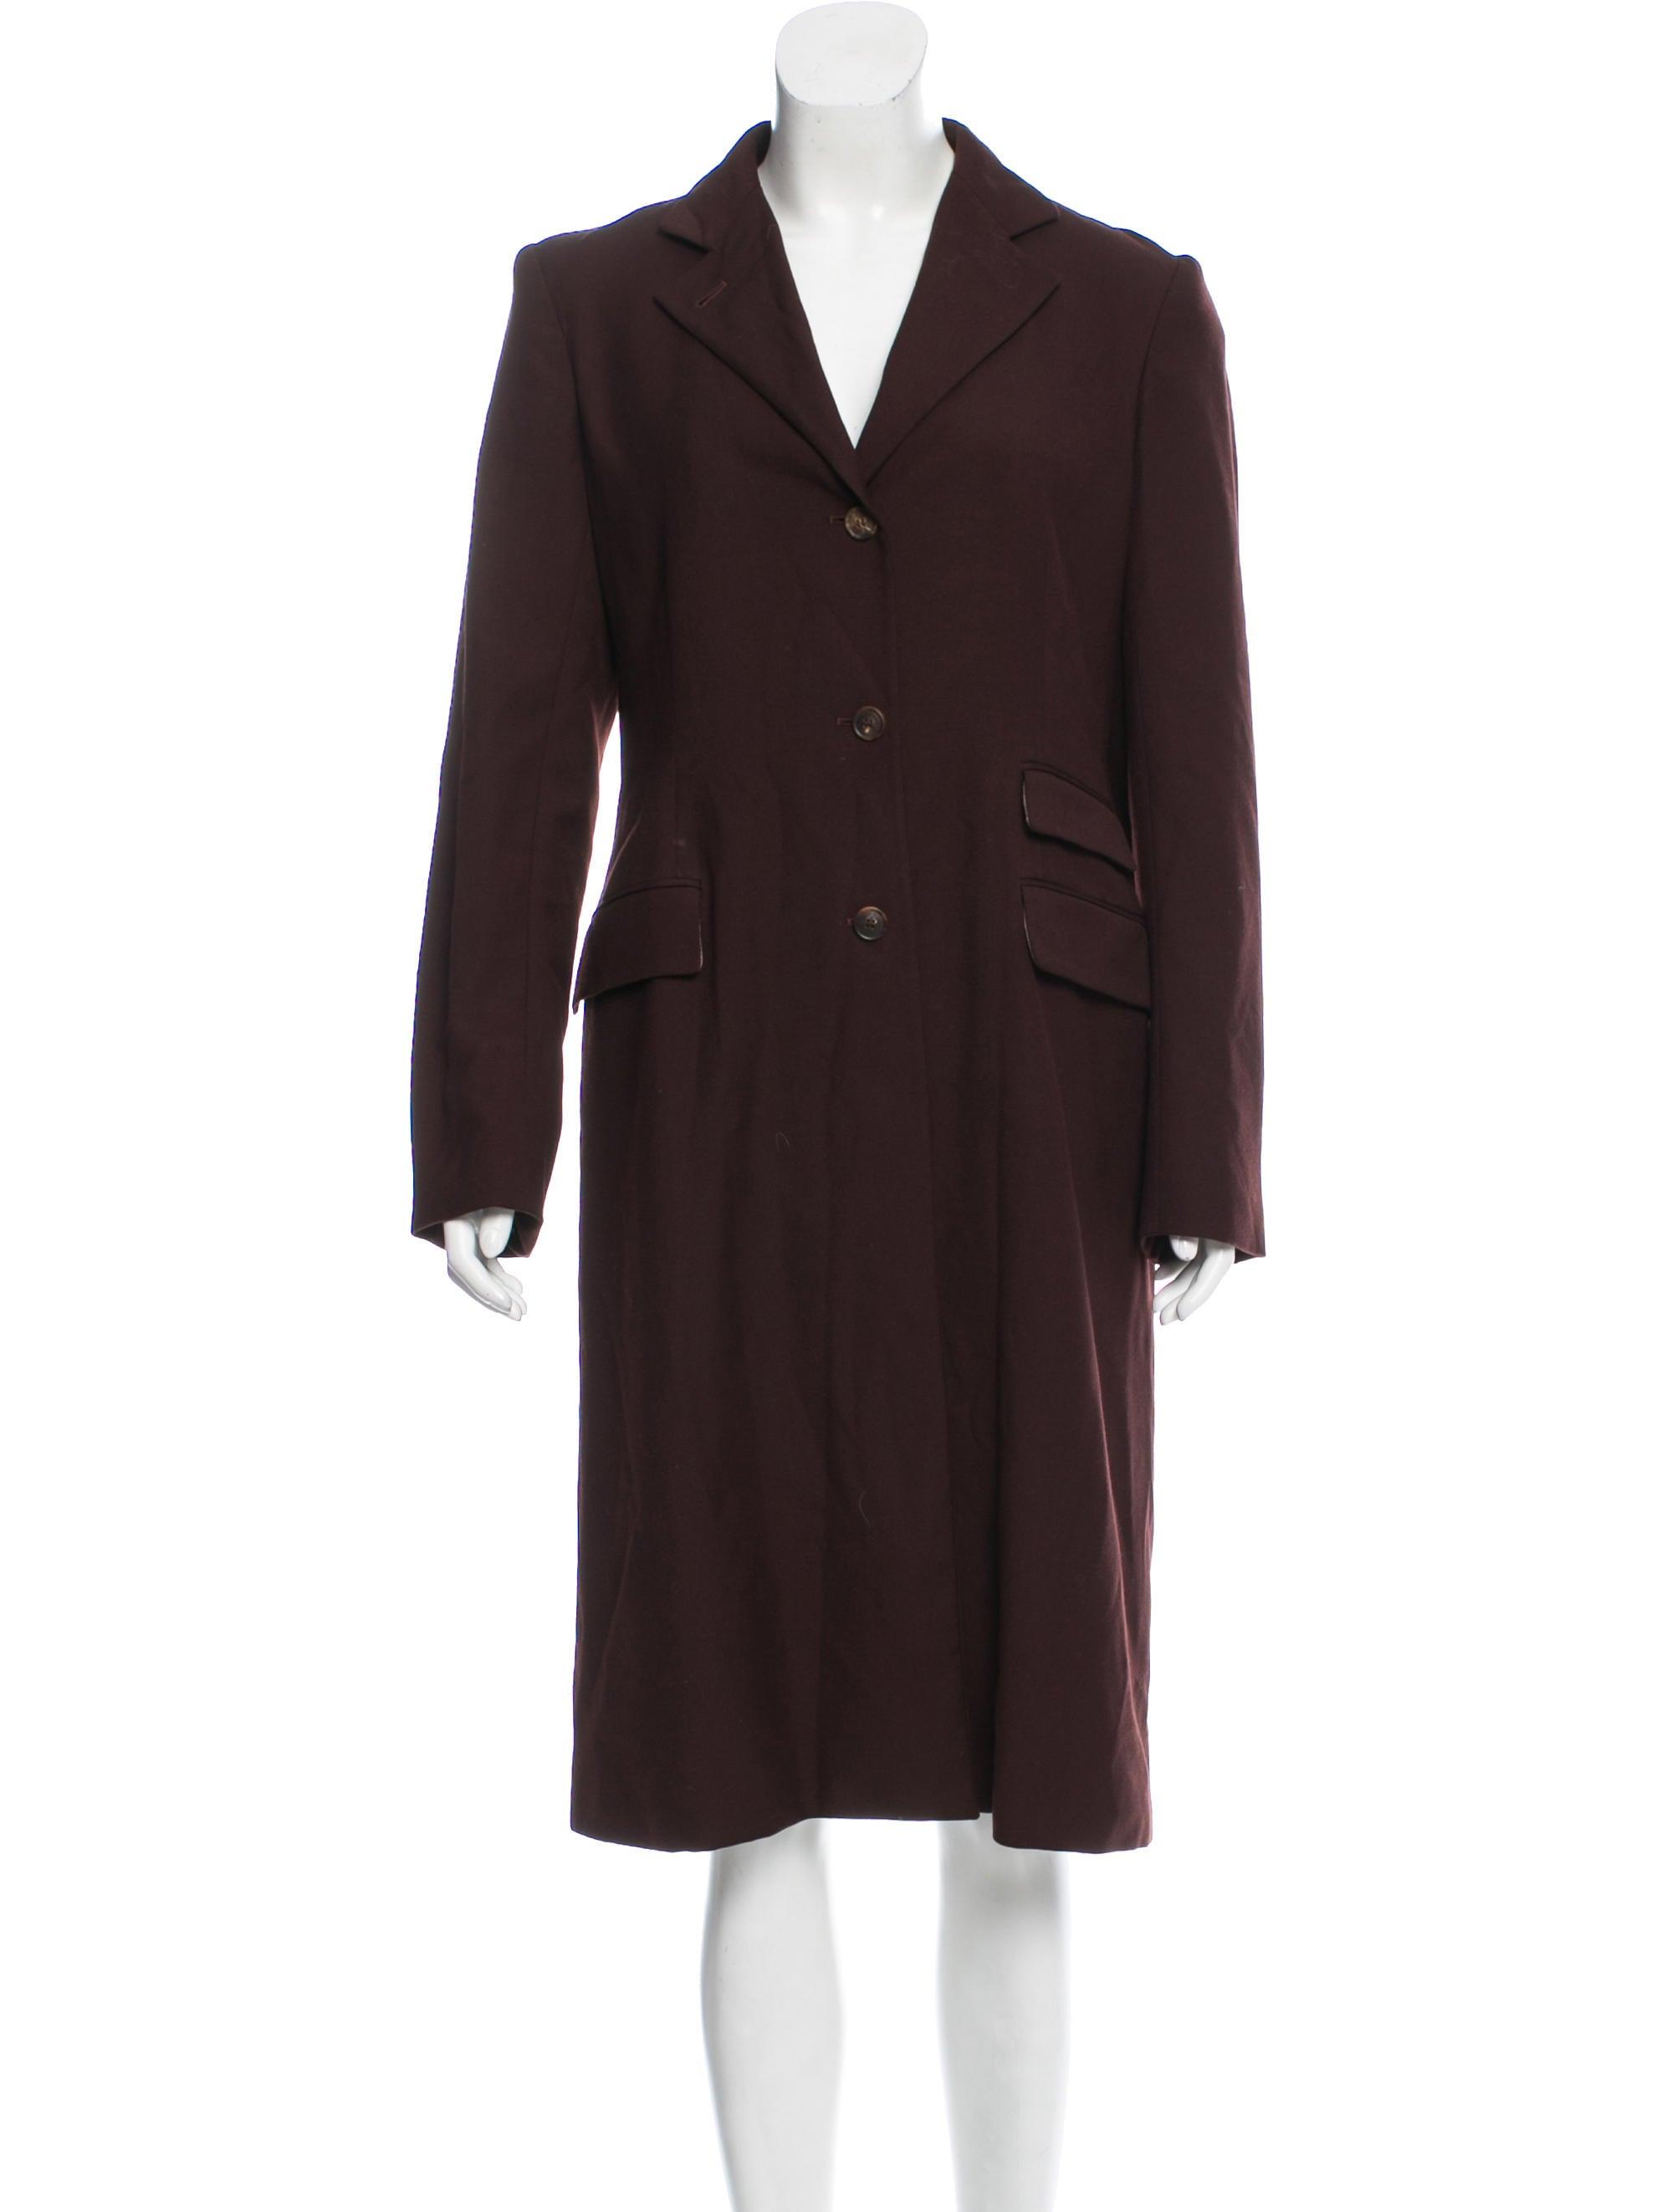 Loro Piana Lightweight Wool Coat - Clothing - LOR37894 | The RealReal